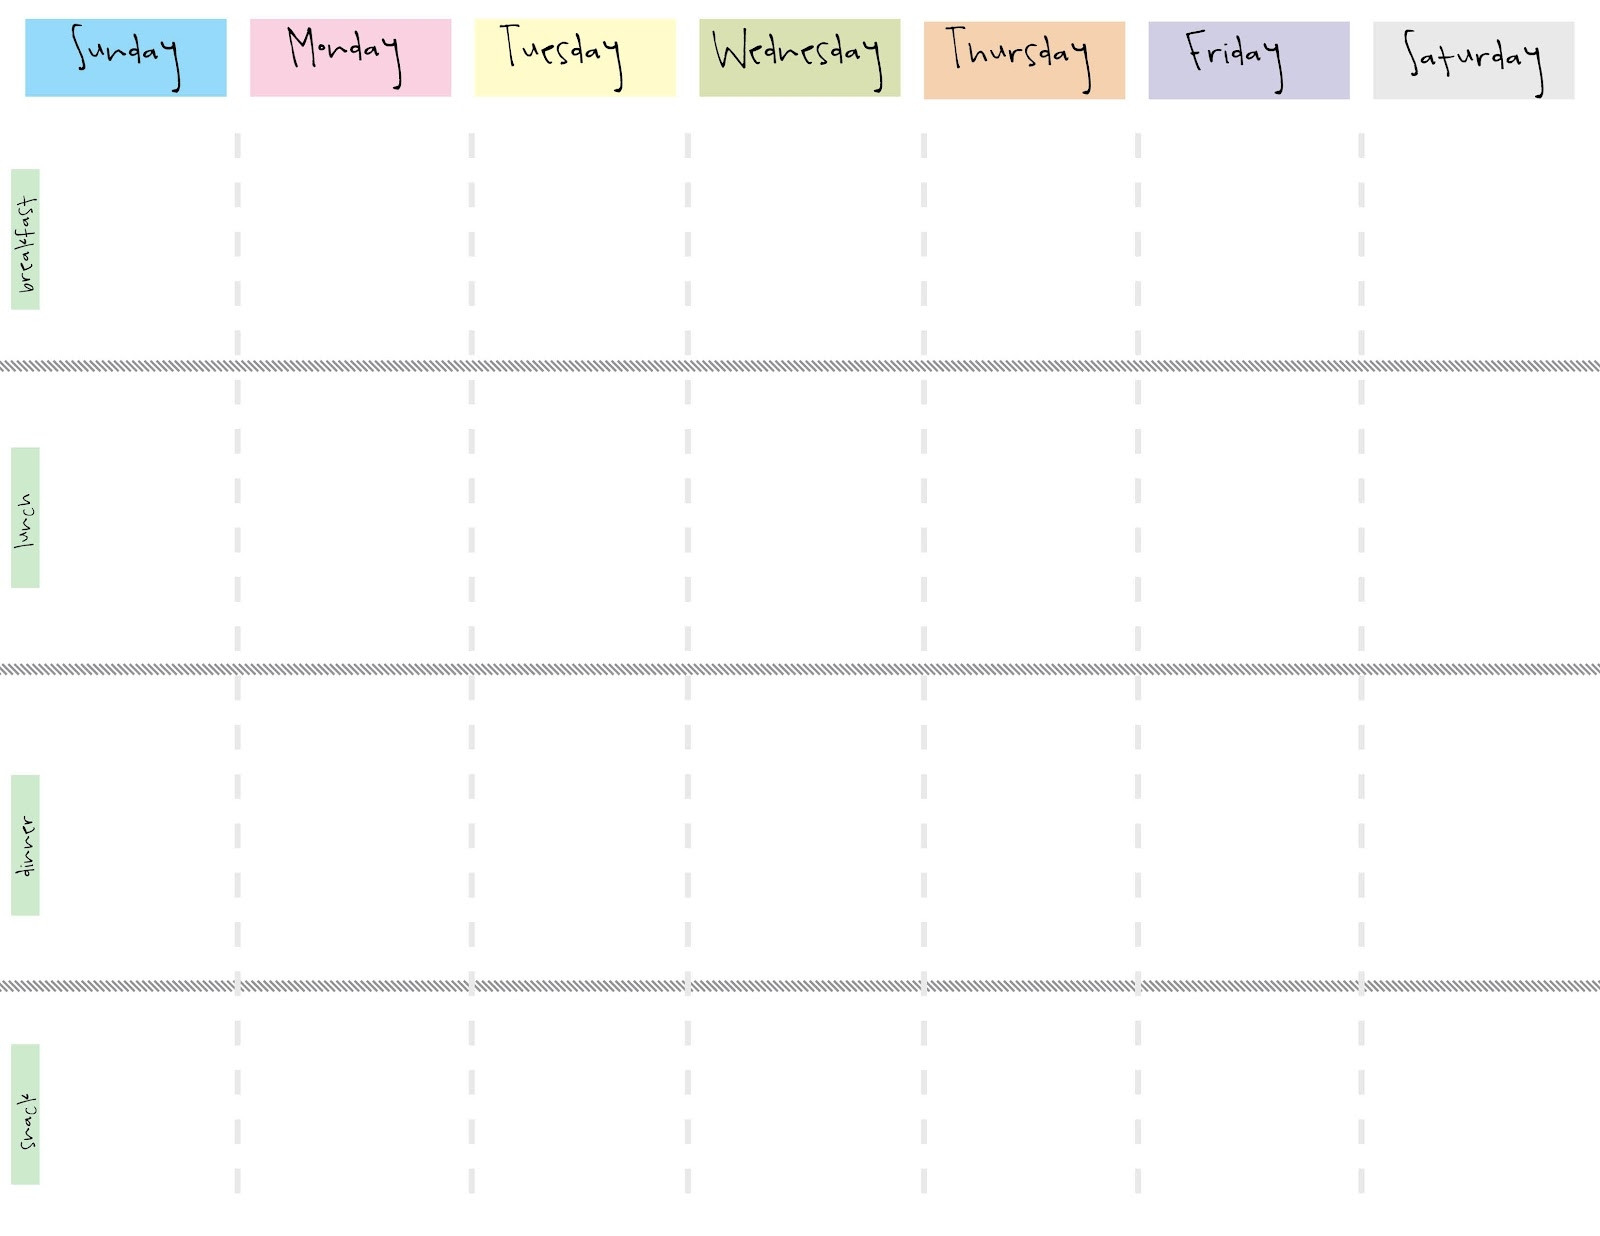 7 Day Weekly Planner Template Printable | Calendar  Blank Weekly Schedule Template 7 Days